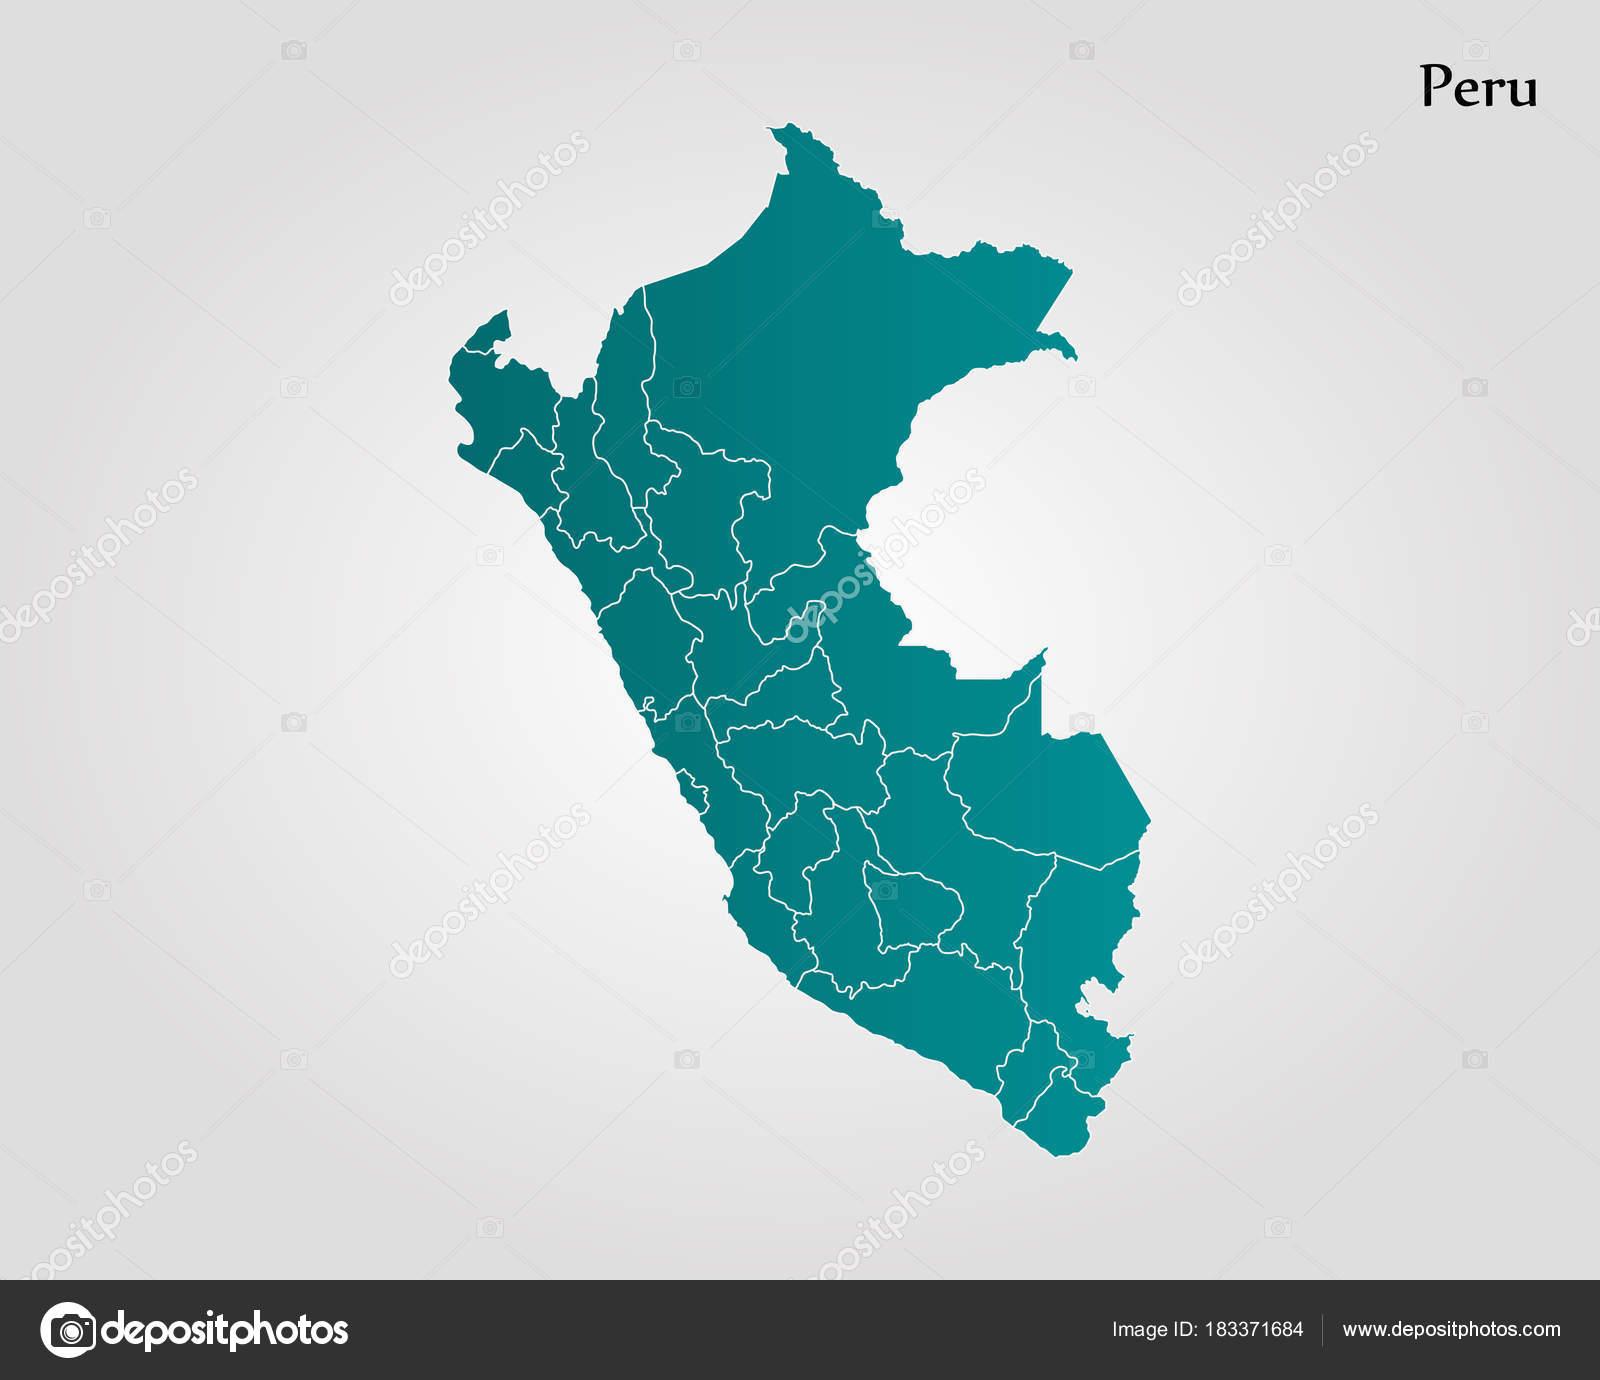 Map of Peru — Stock Vector © Uglegorets #183371684